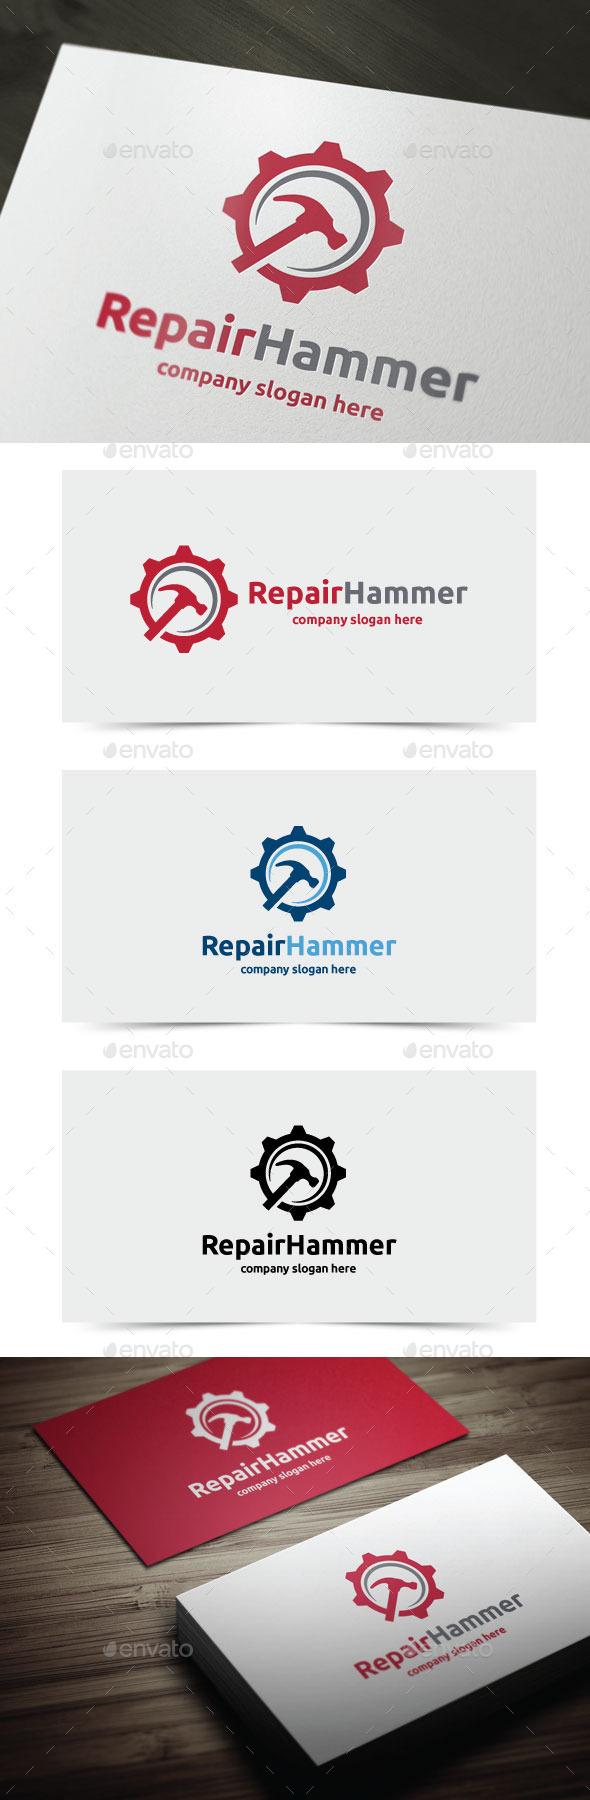 GraphicRiver Repair Hammer 10769615